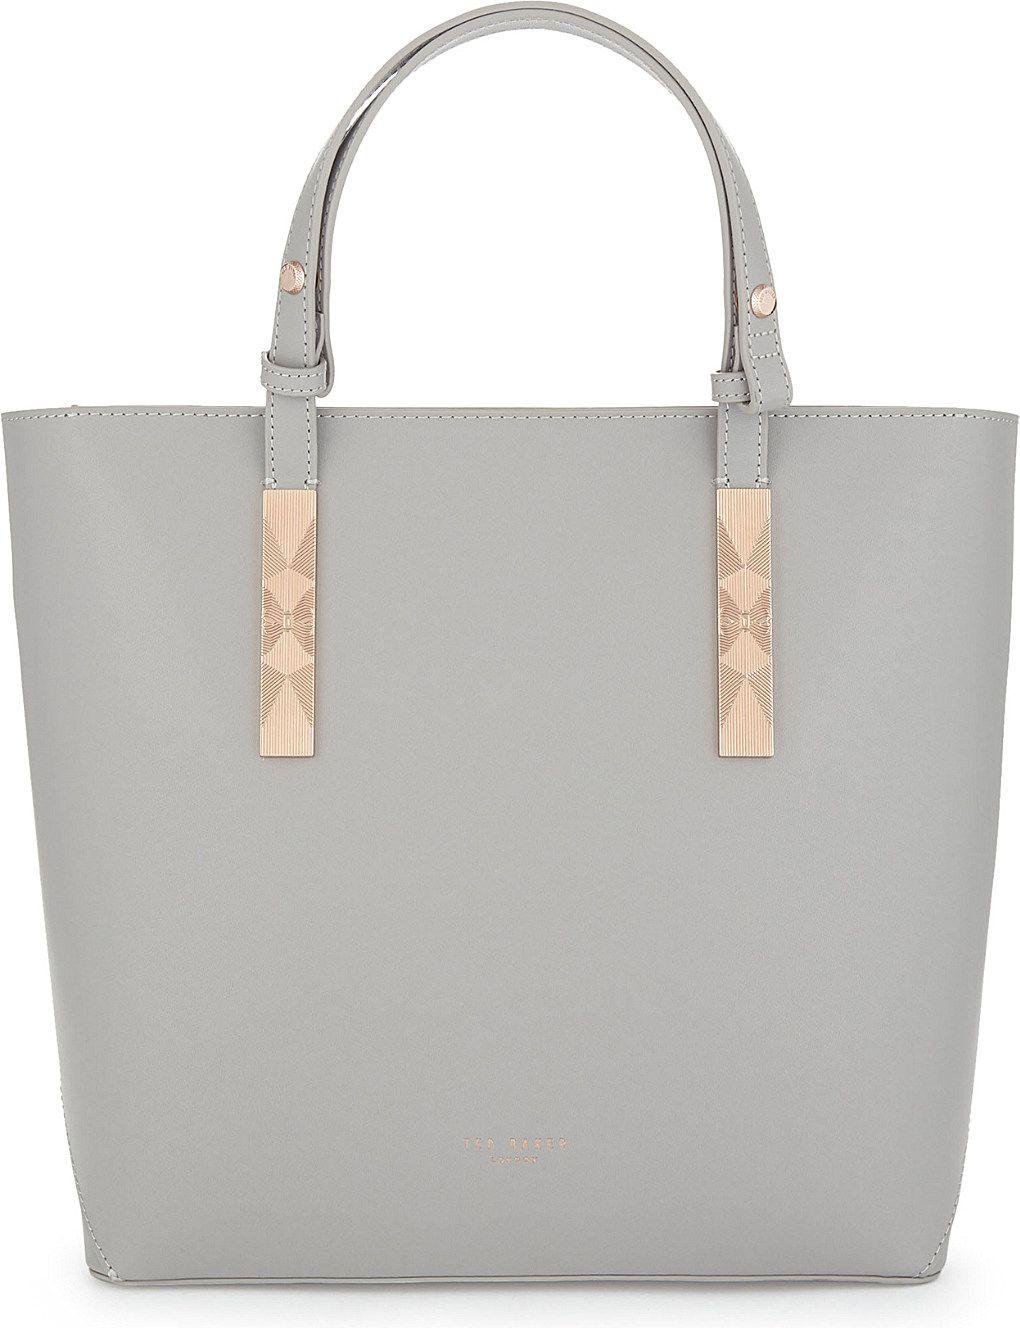 9b7c07e334792e TED BAKER Jaceyy leather shopper bag